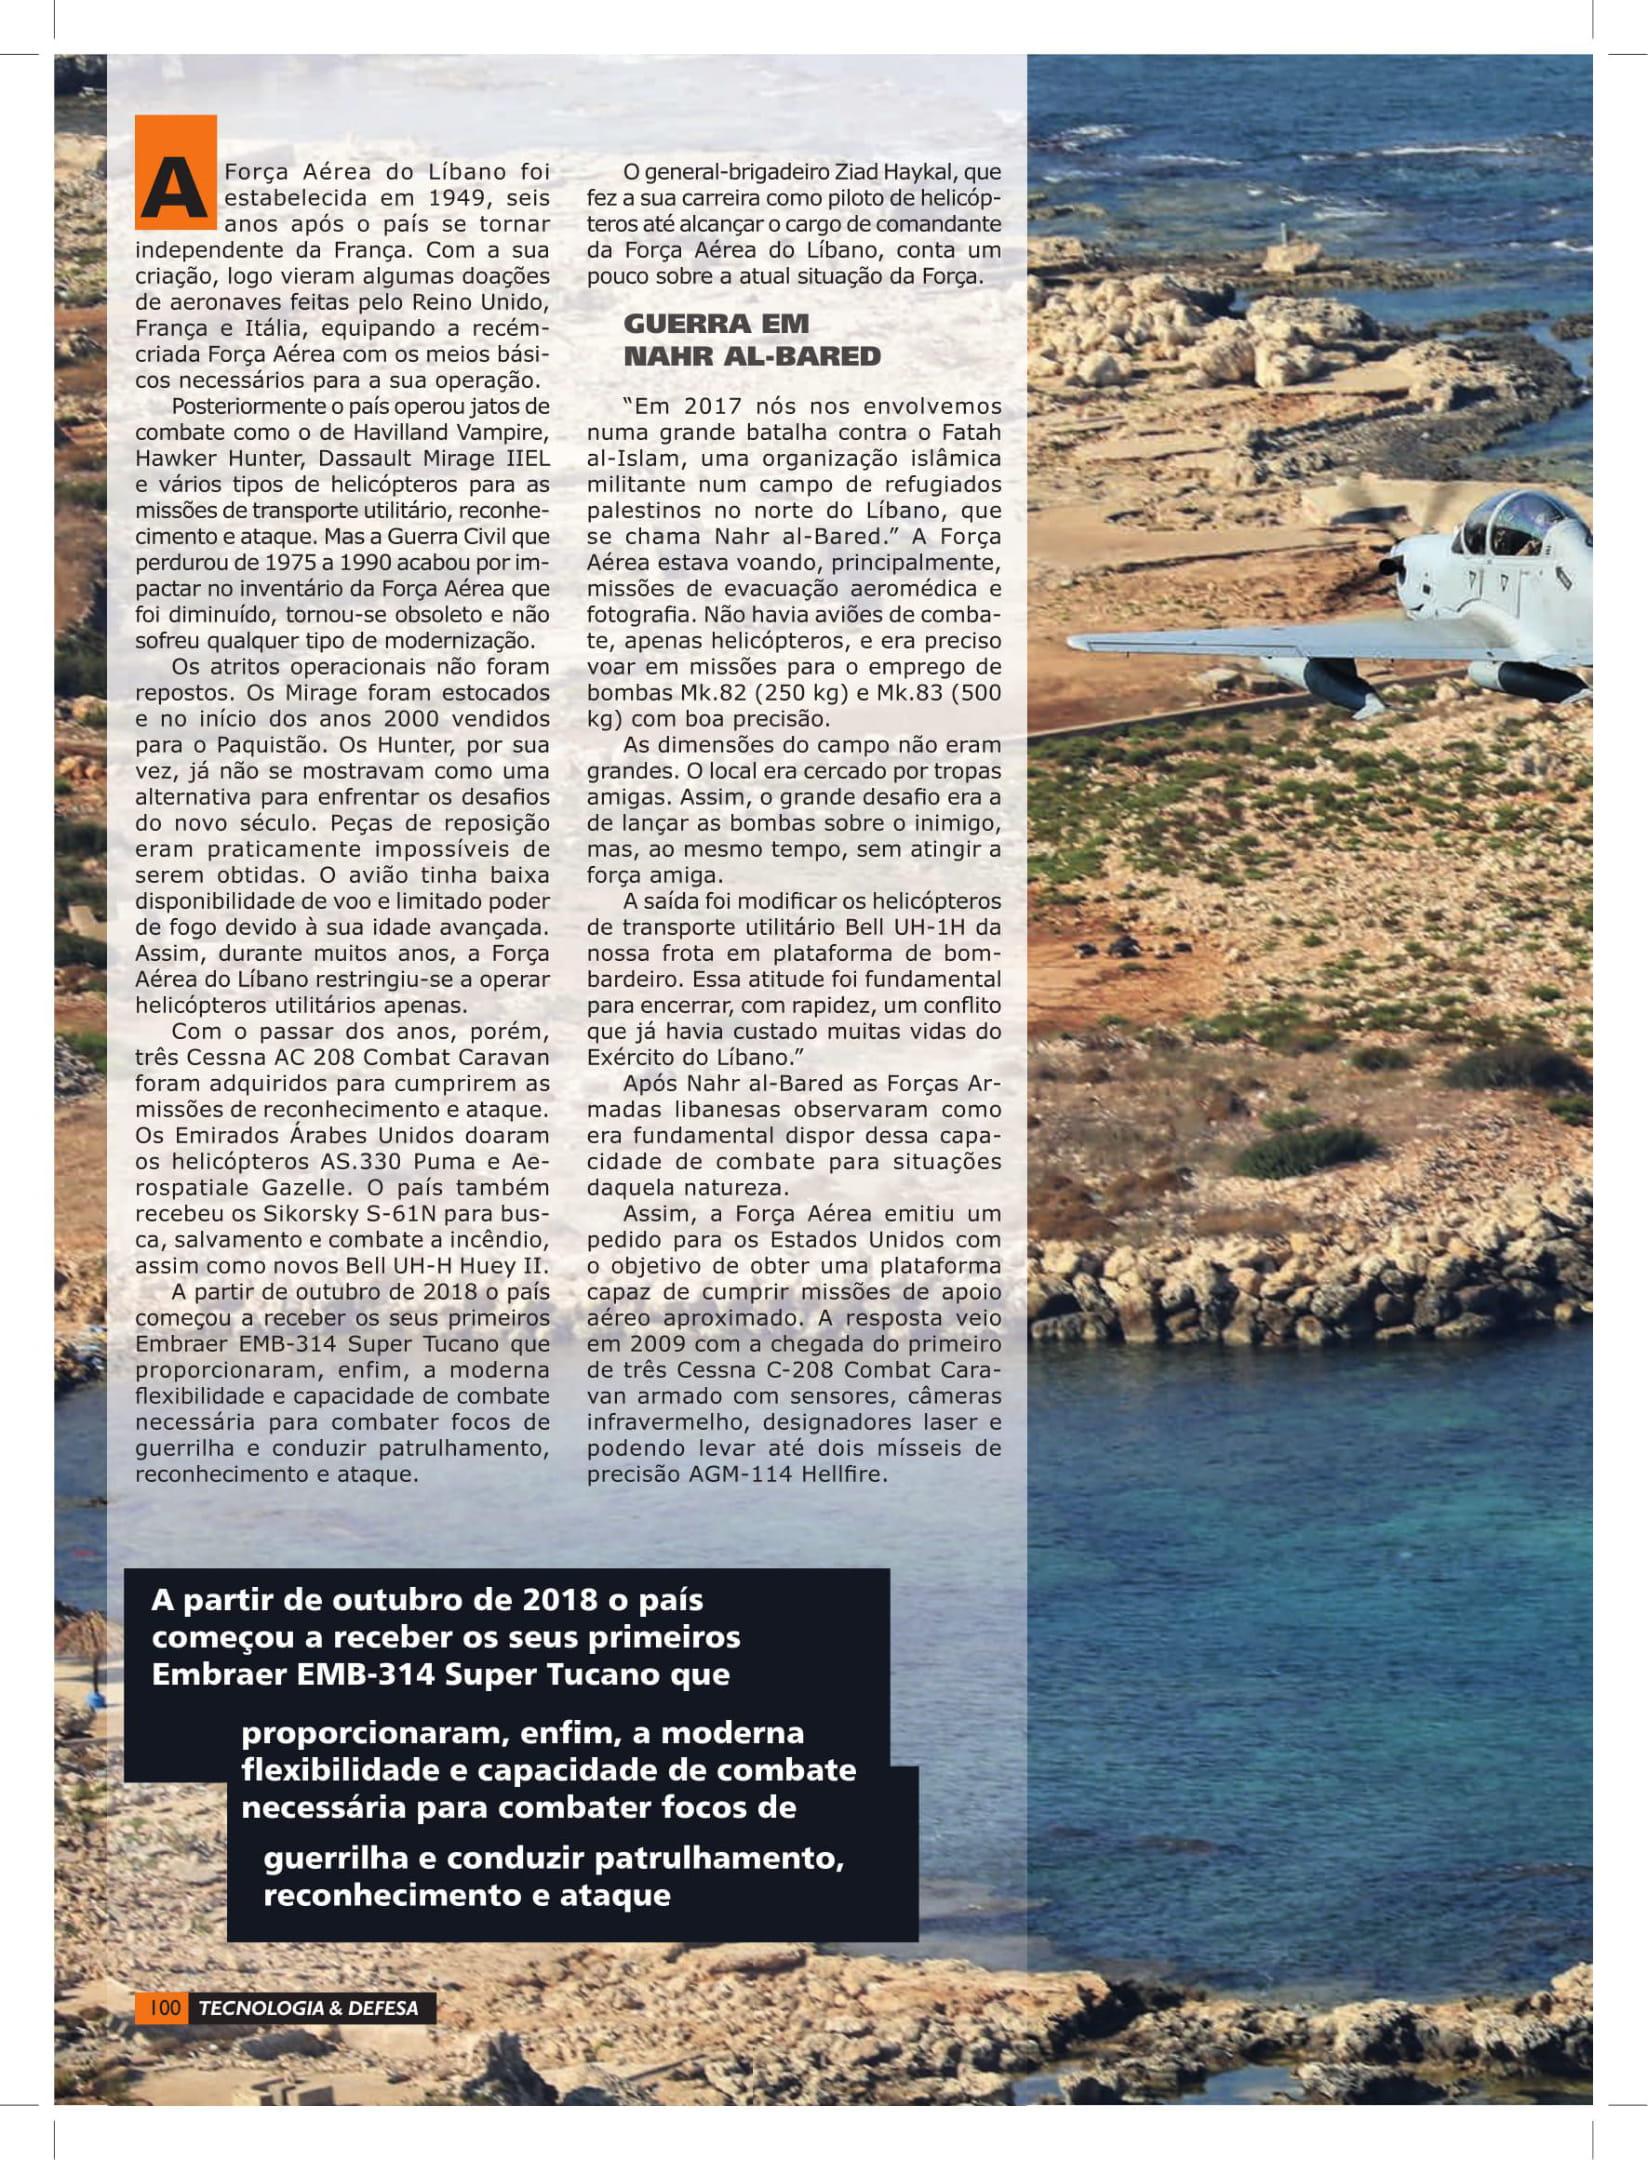 Tecnologia & Defesa (Brazil)_Lebanese Air Force-4